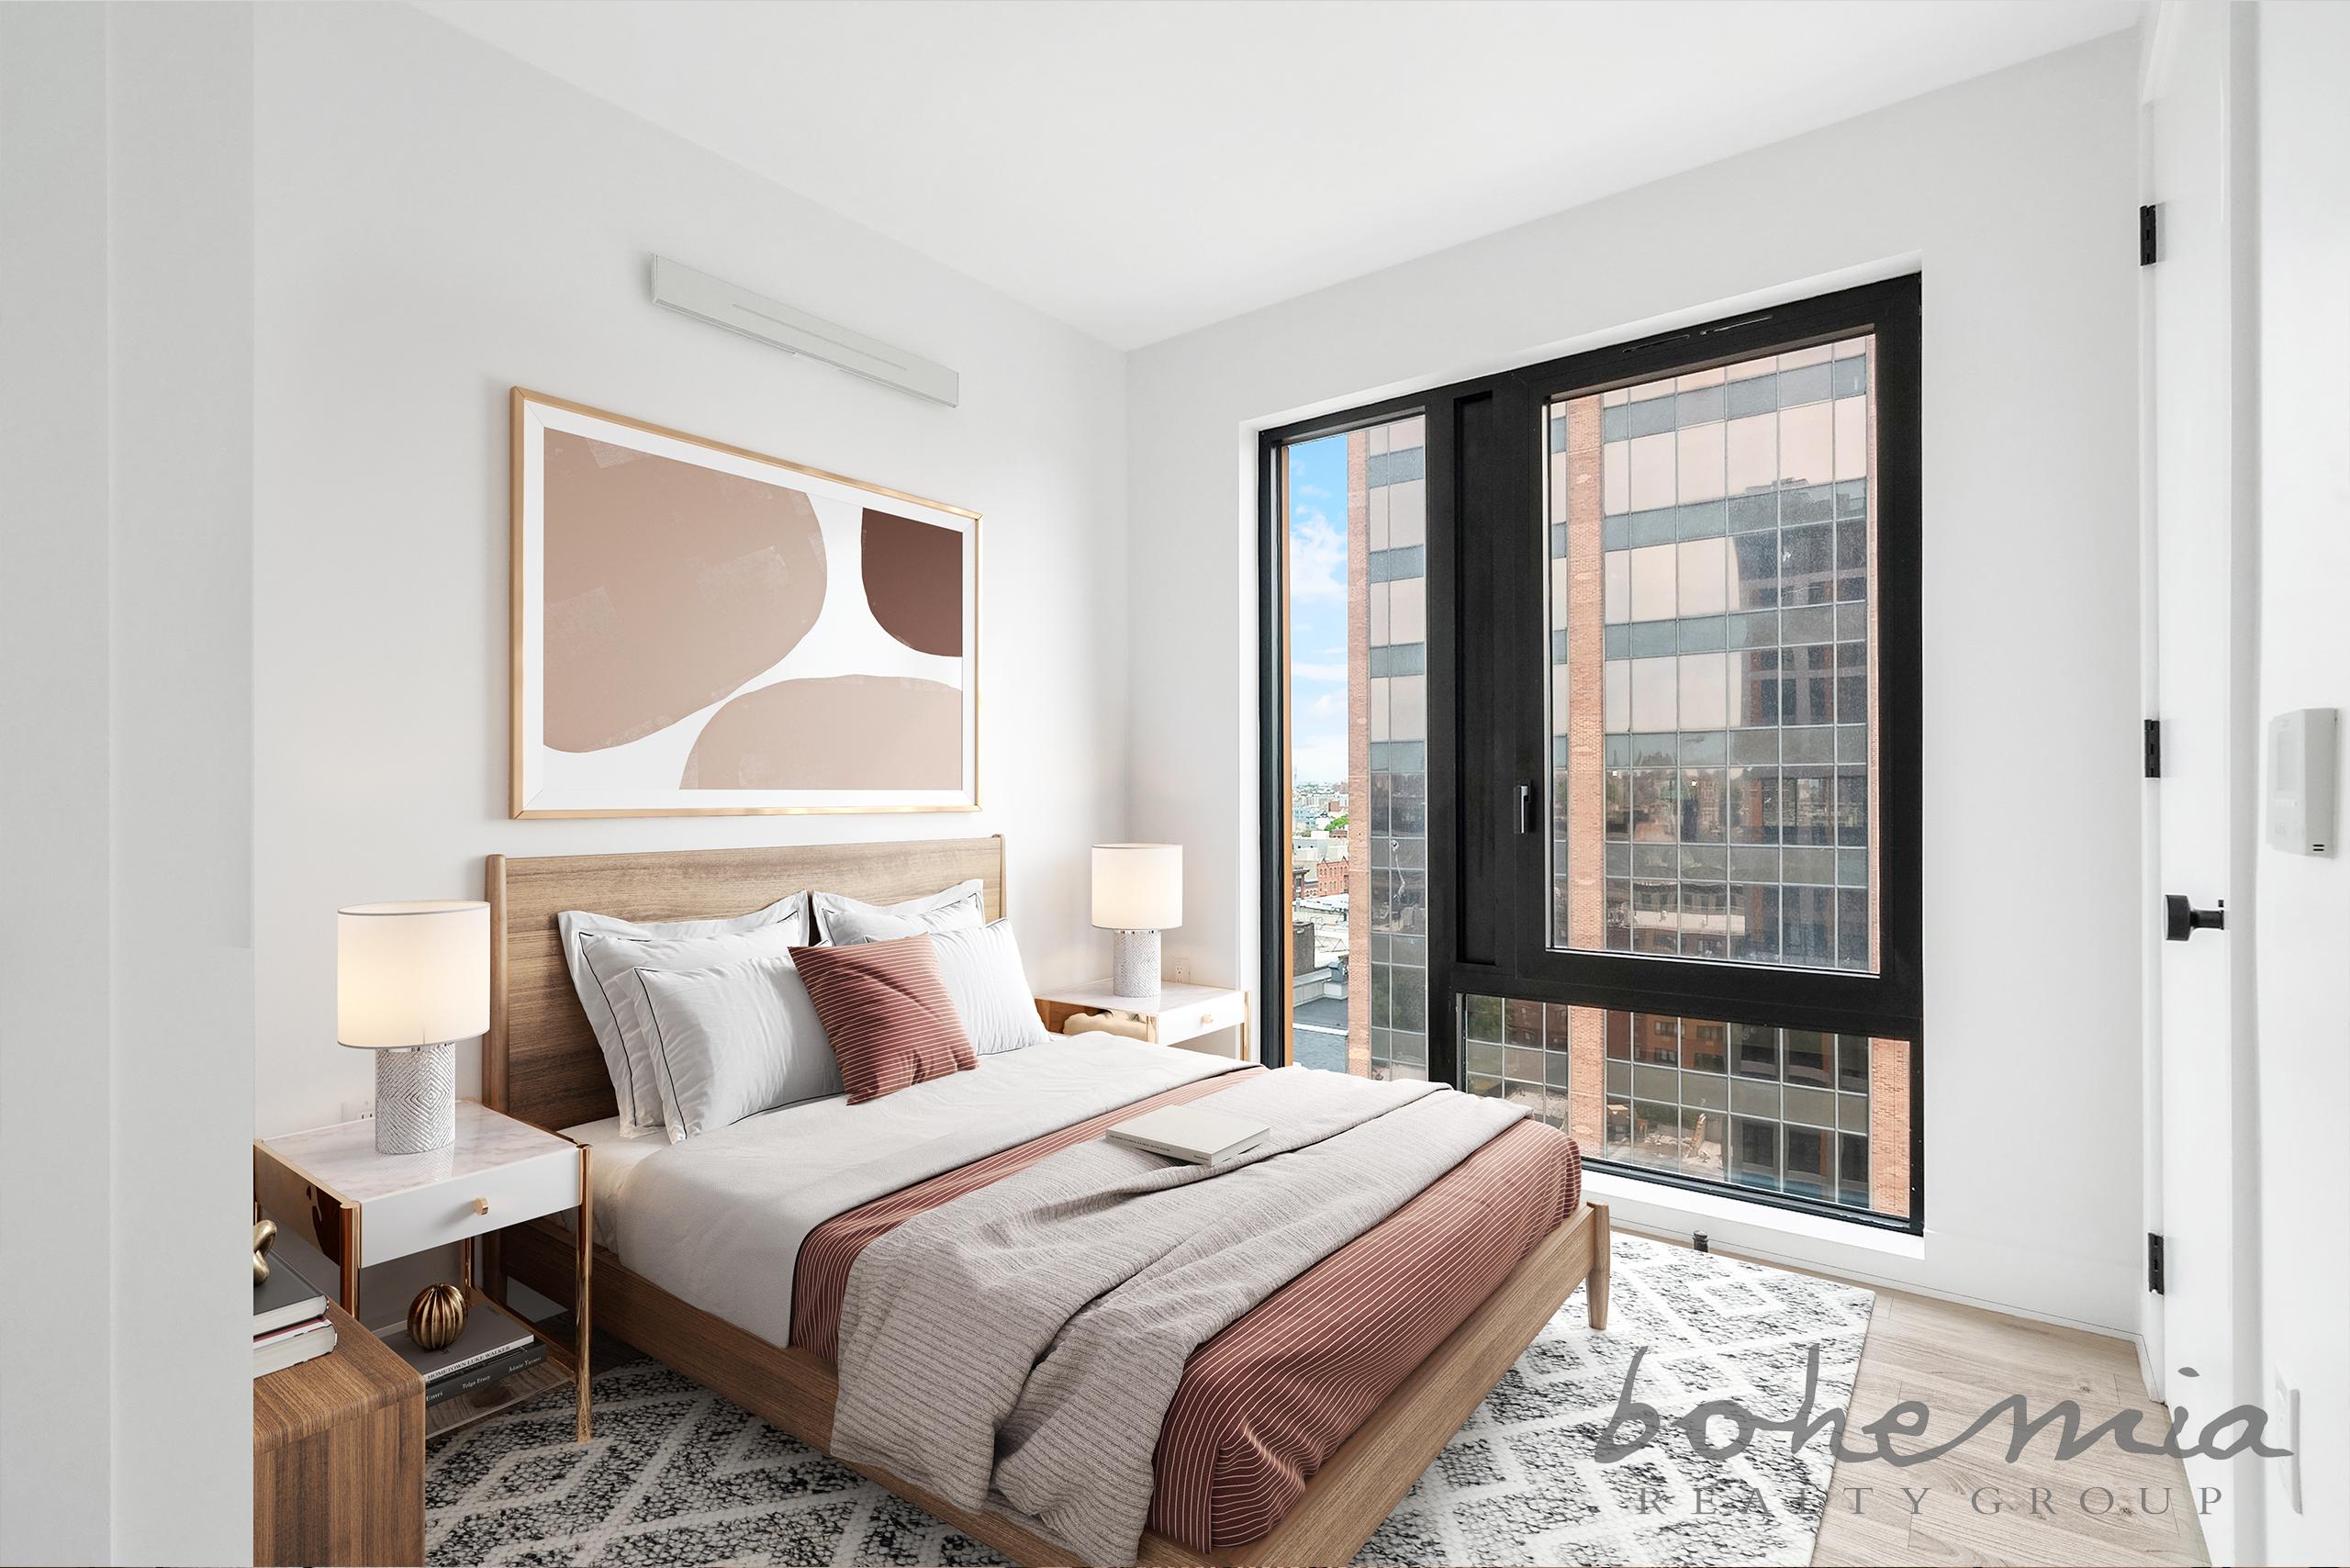 60 West 125th Street West Harlem New York NY 10027